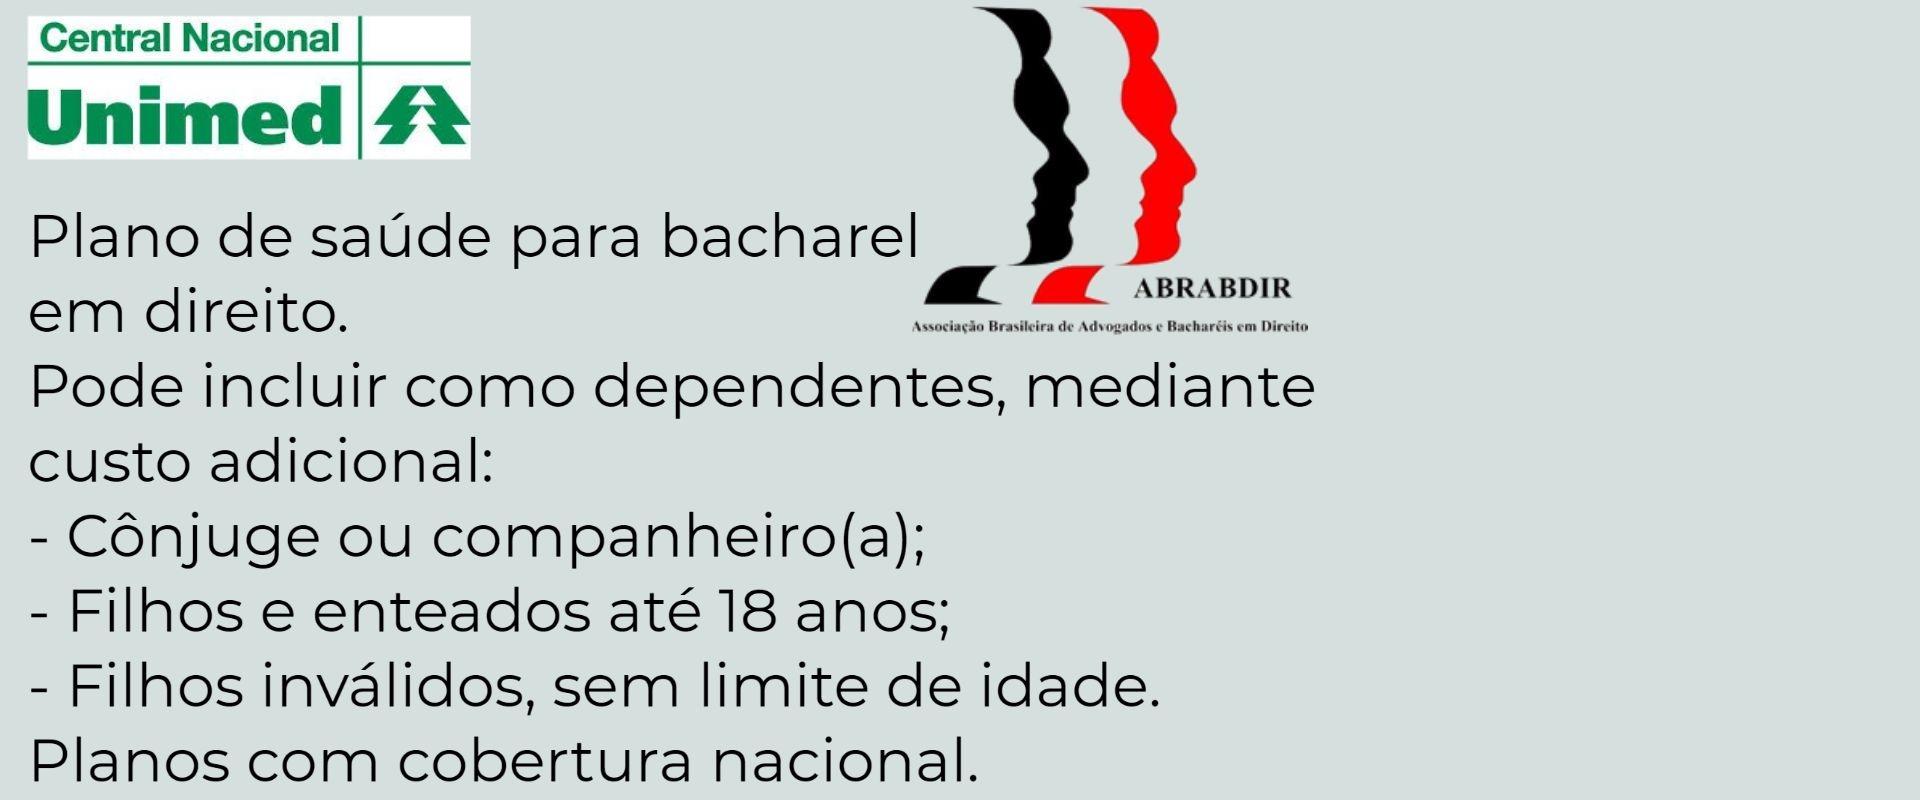 Unimed ABRABDIR Presidente Prudente